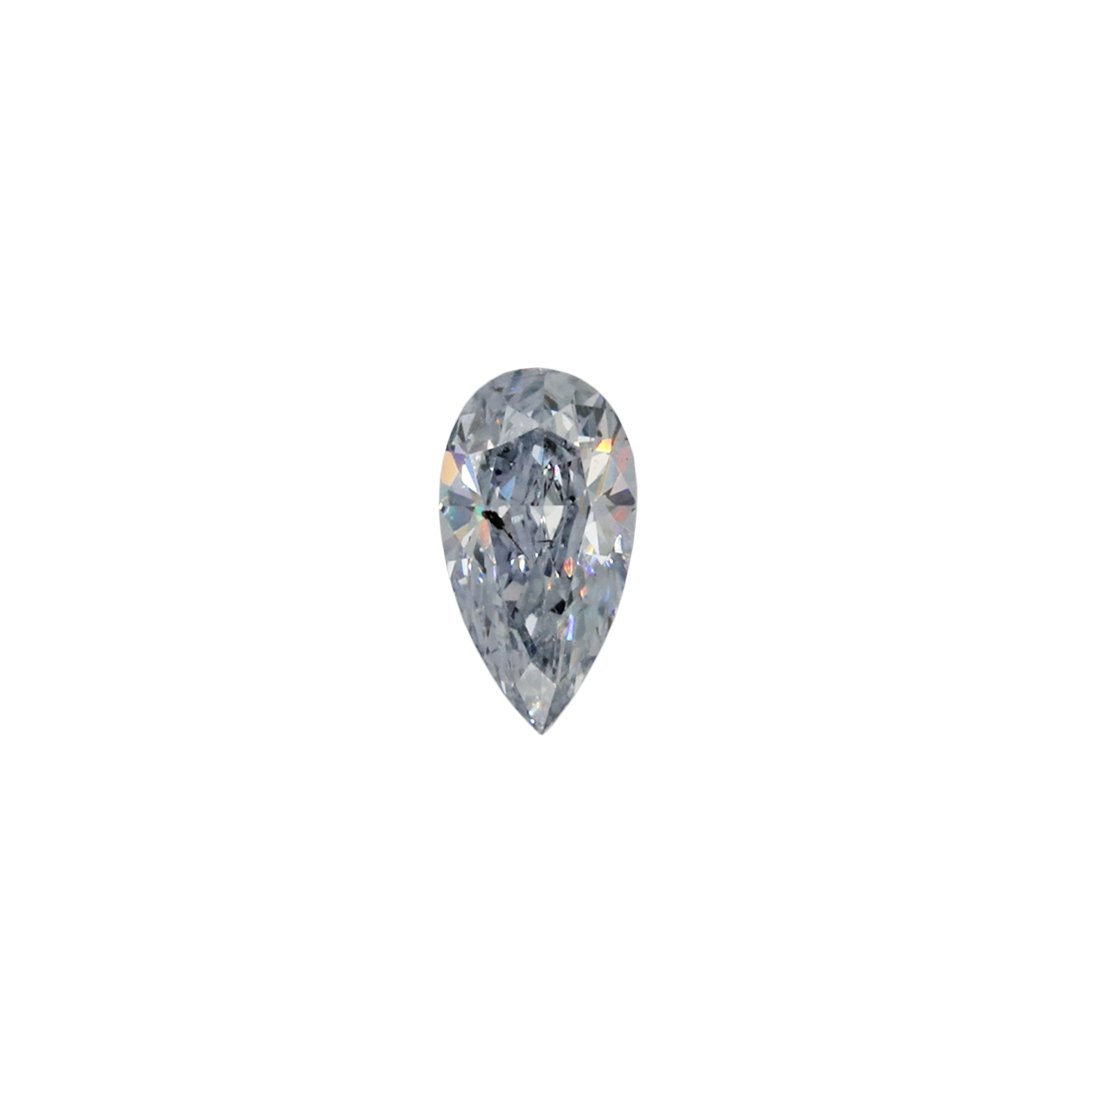 0.11ct Natural Fancy Bluish Grey, BL1, SI2, Argyle Pink Diamond